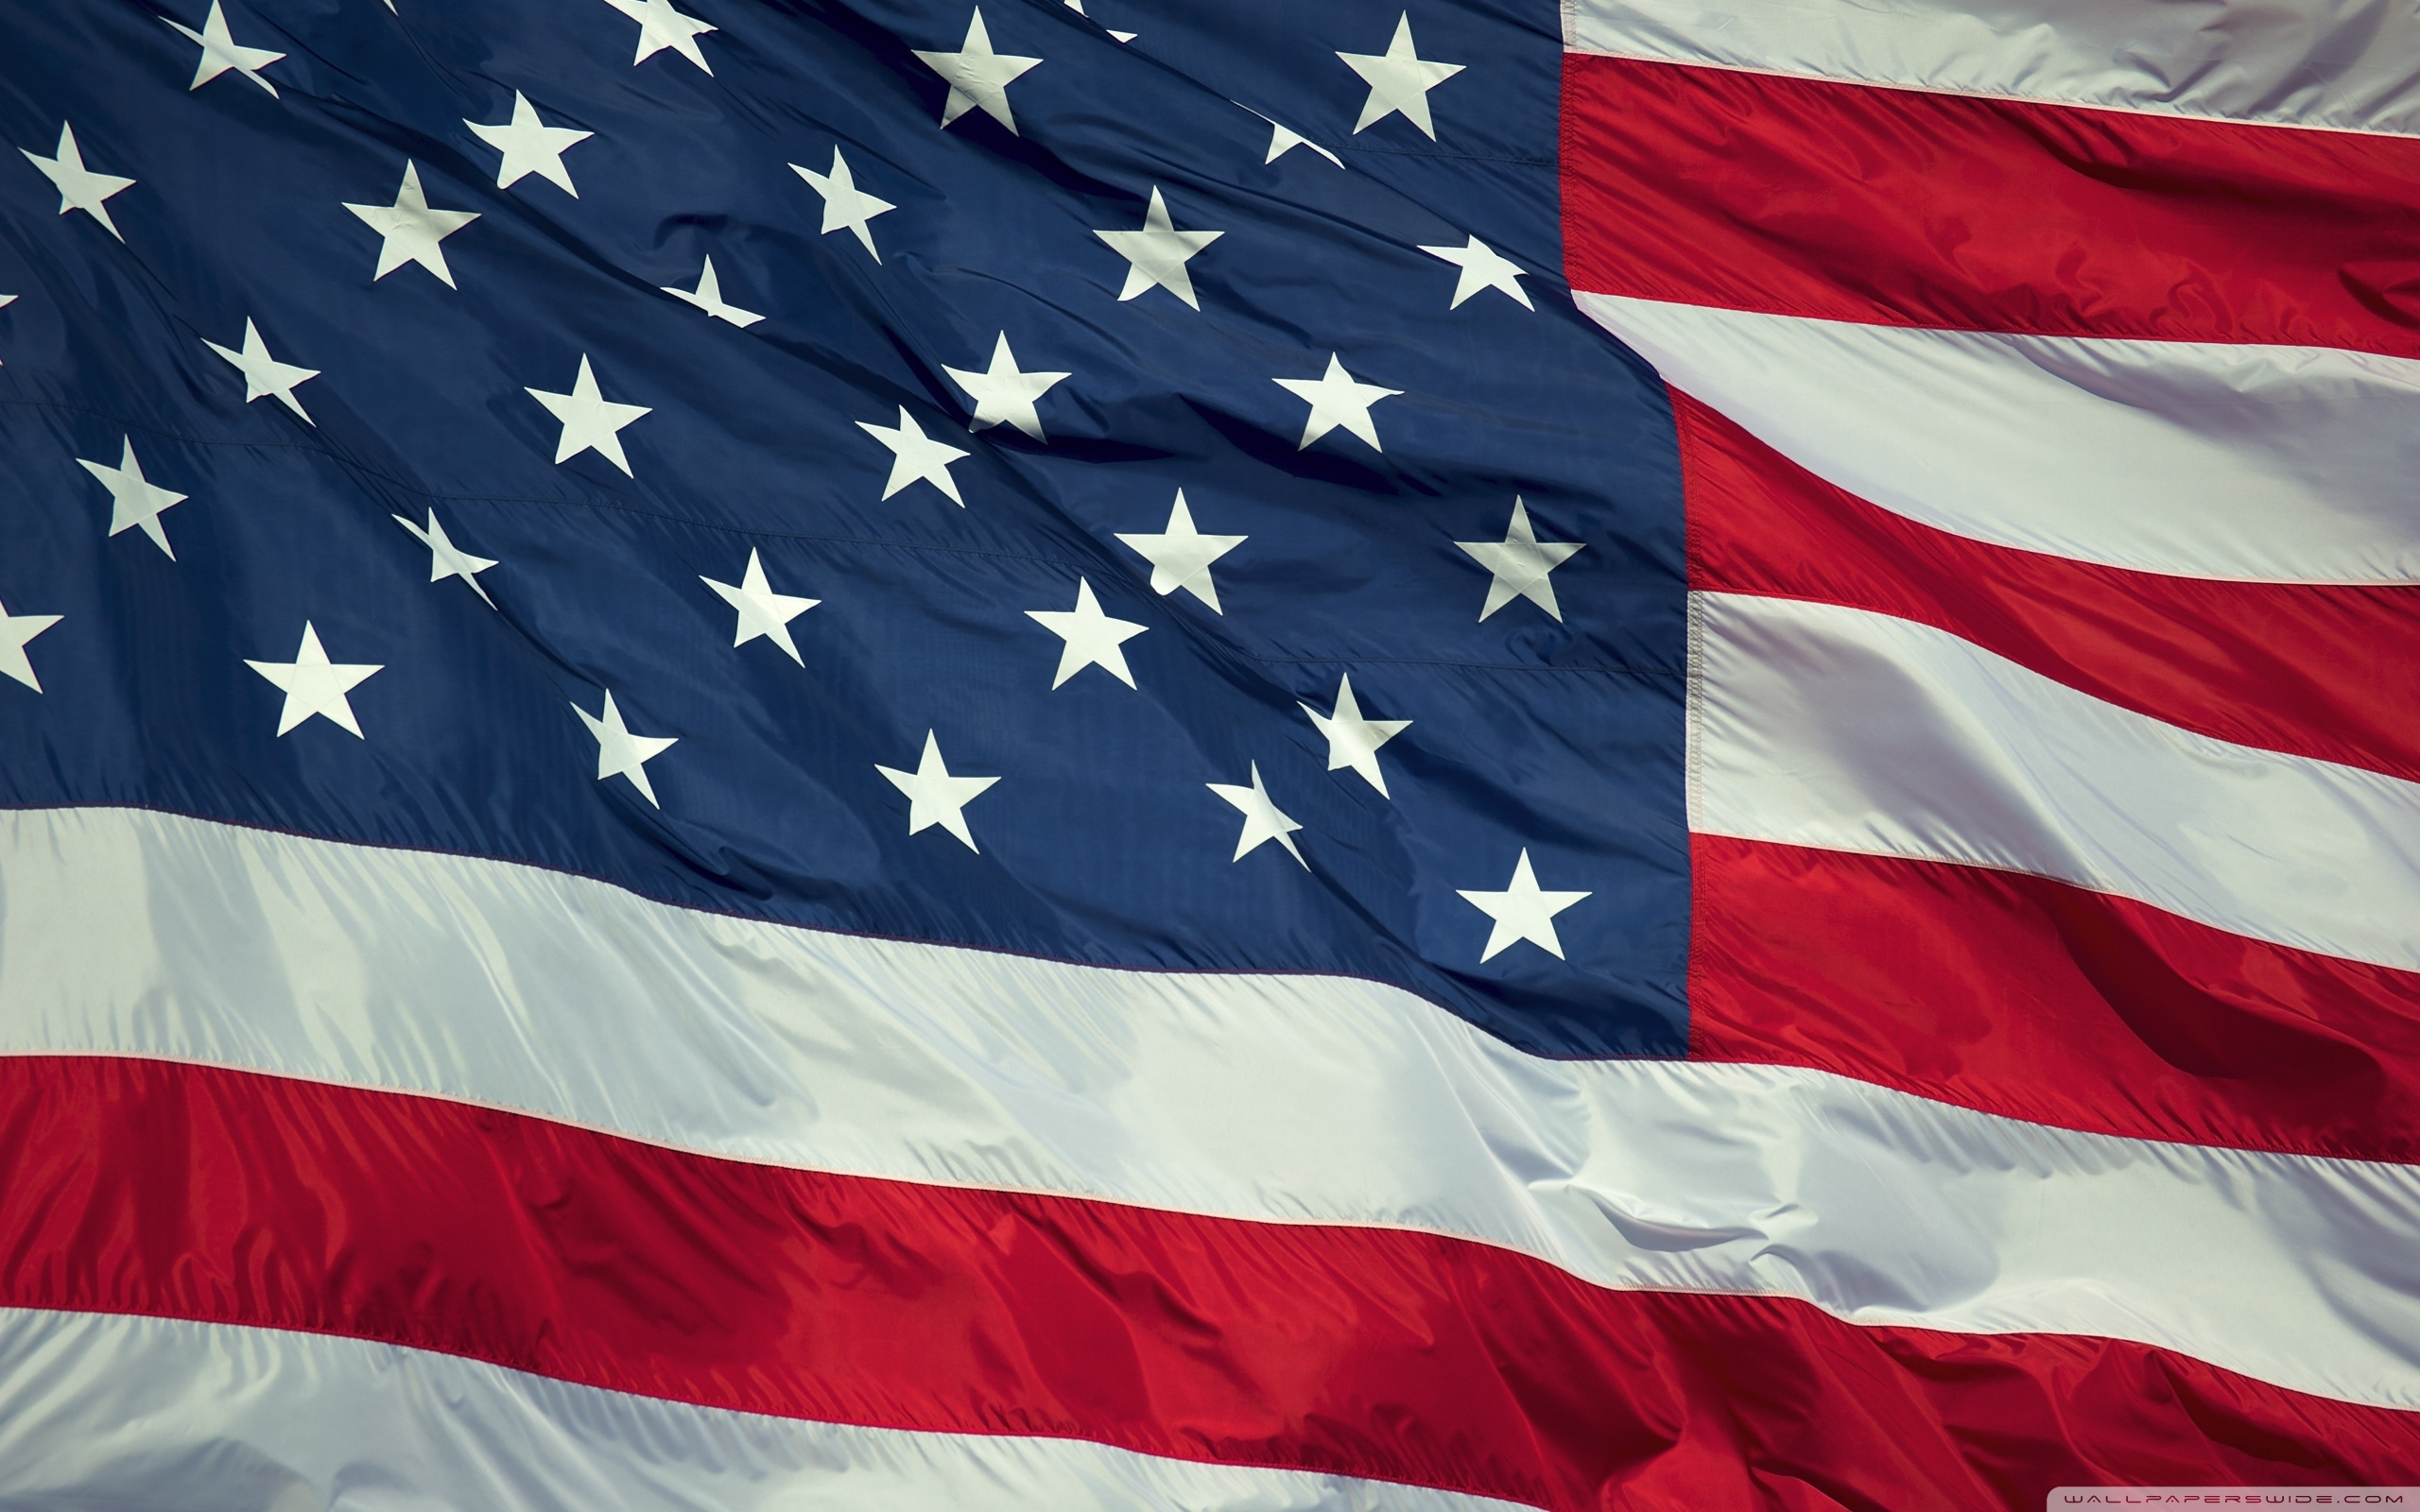 american flag ❤ 4k hd desktop wallpaper for 4k ultra hd tv • tablet